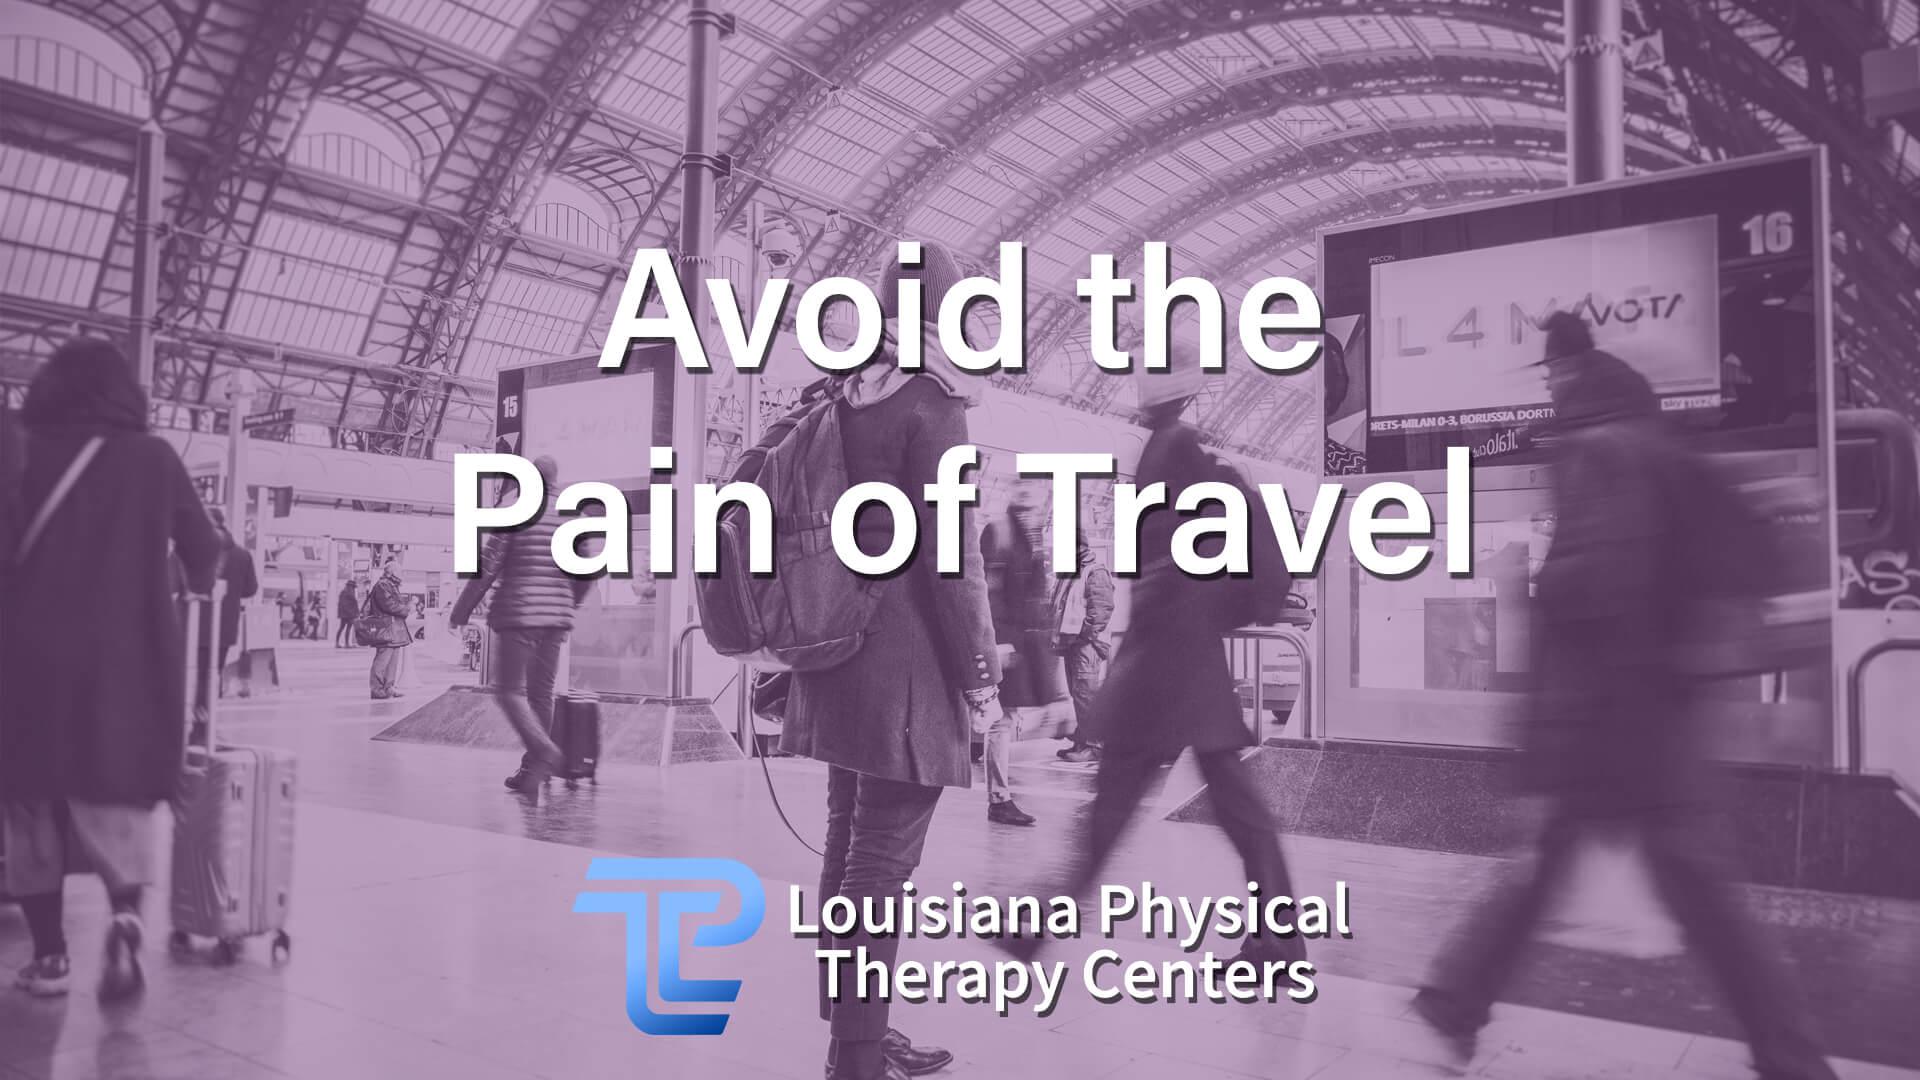 Avoid the Pain of Travel